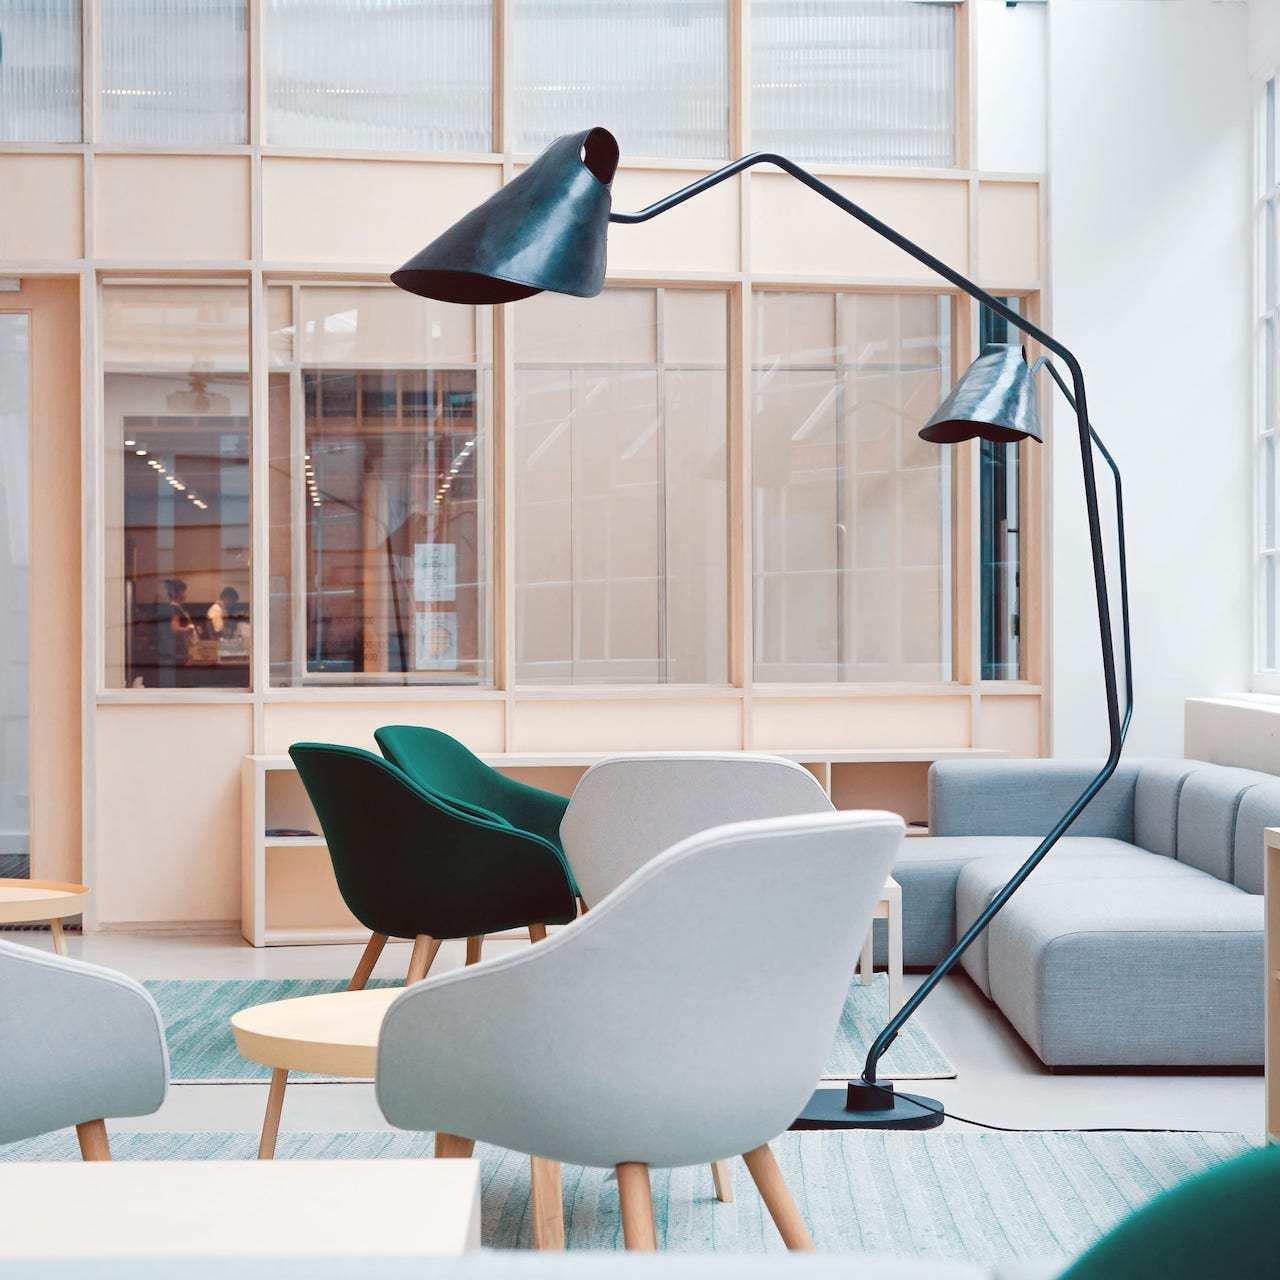 image of office interior design